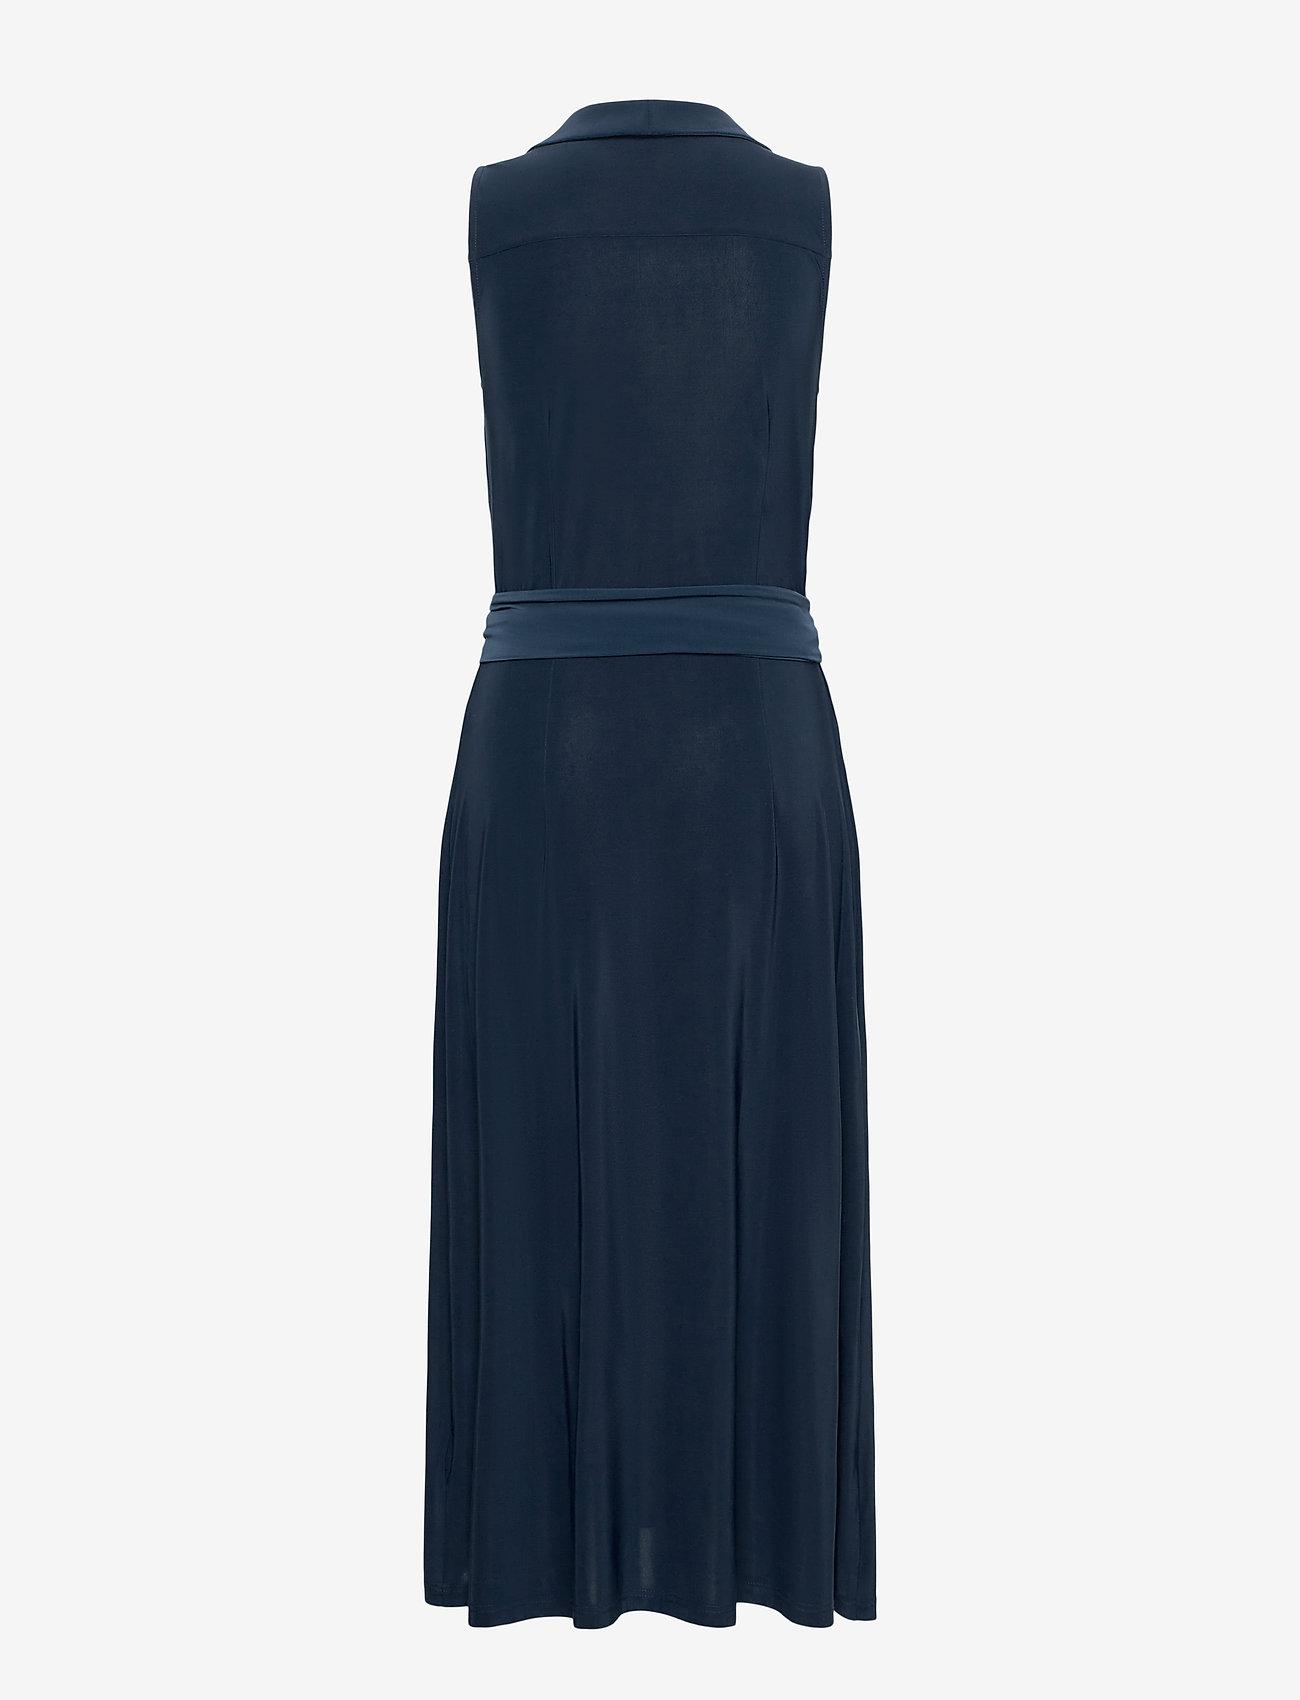 Ilse Jacobsen - Dress - cocktailkjoler - indigo - 1